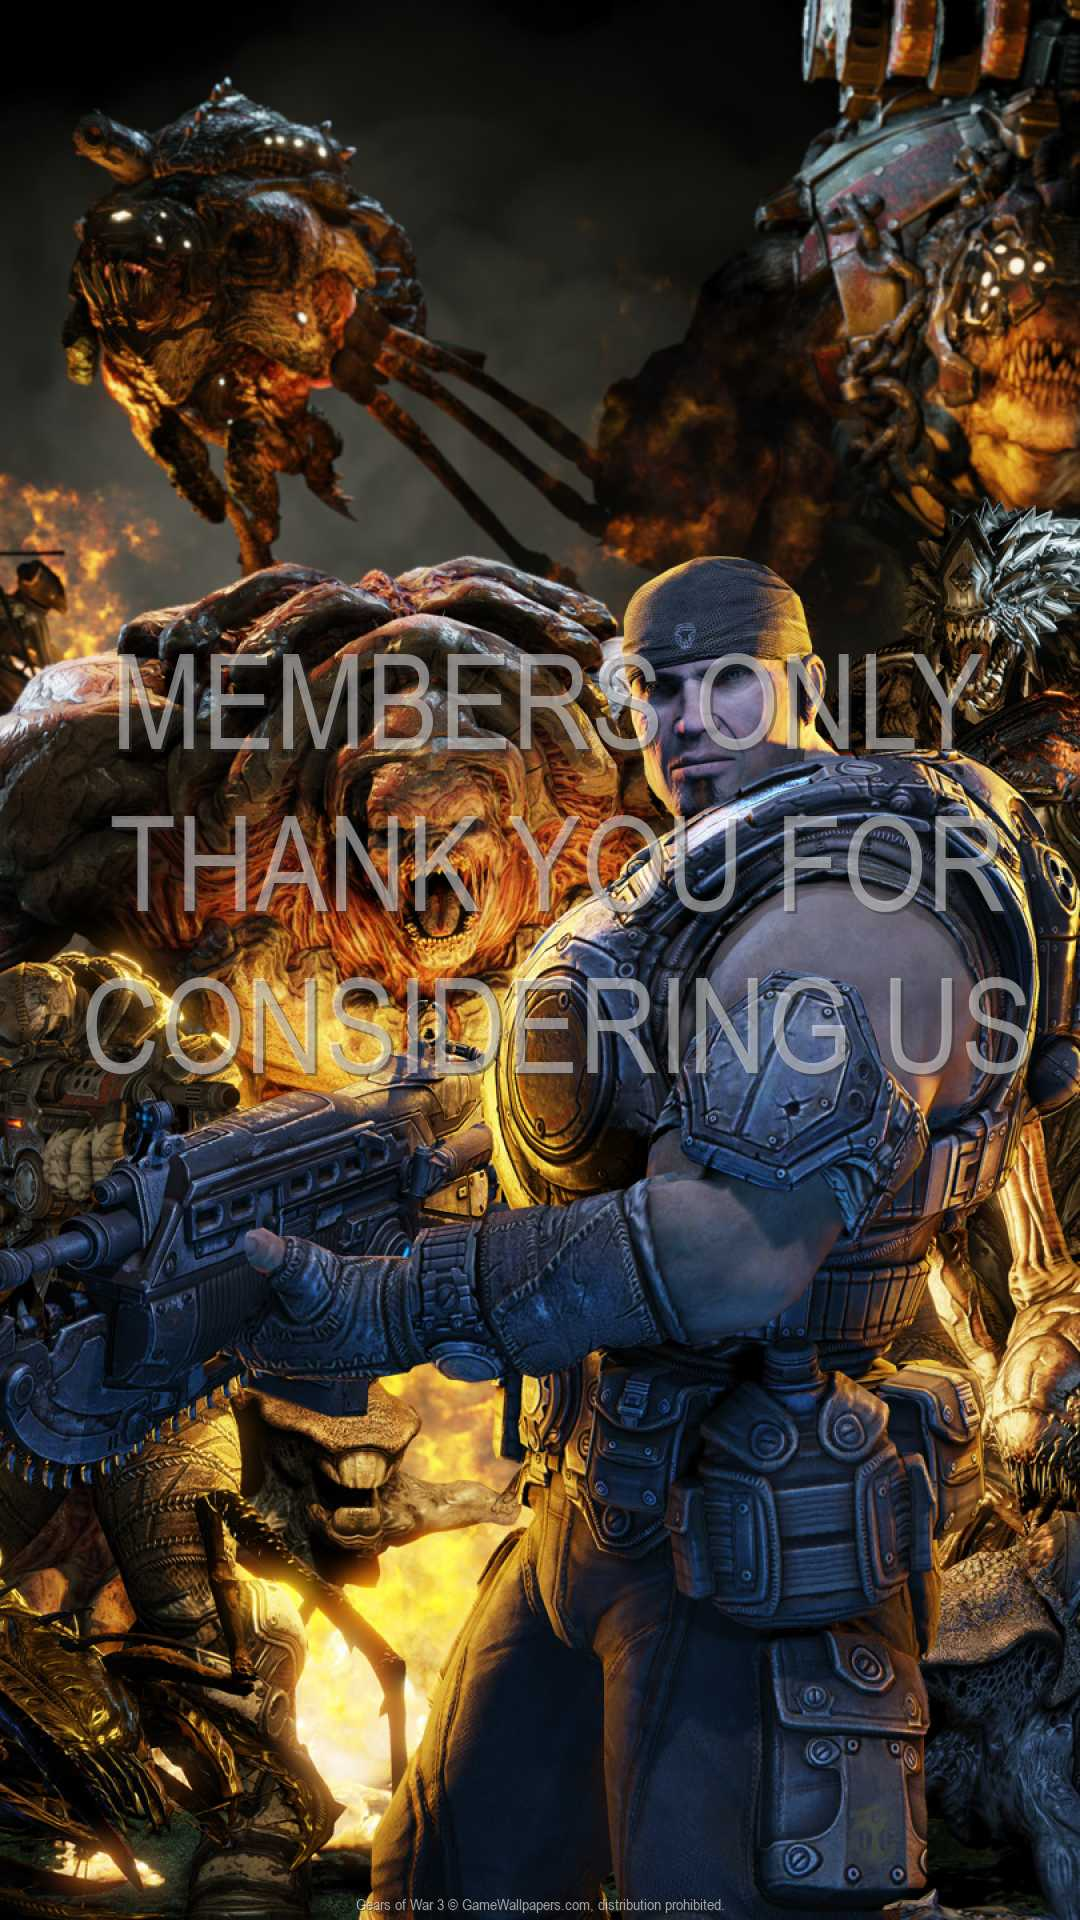 Gears of War 3 1080p Vertical Handy Hintergrundbild 03